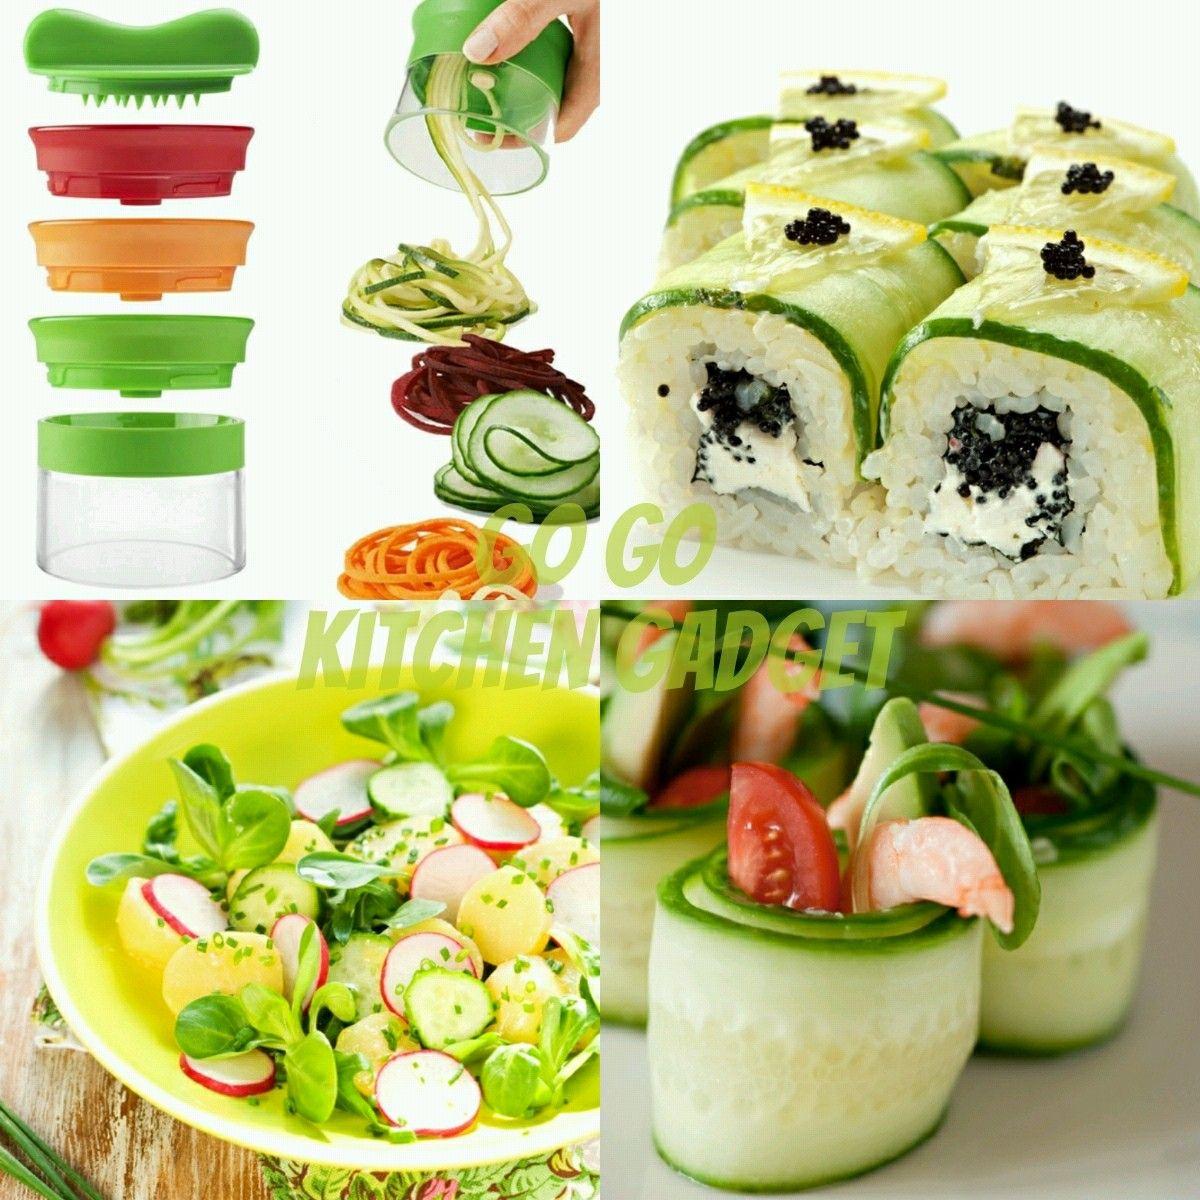 With Go Go Kitchen Gadgets Vegetable Spiralizer. Make Veghie Noodles In No  Time